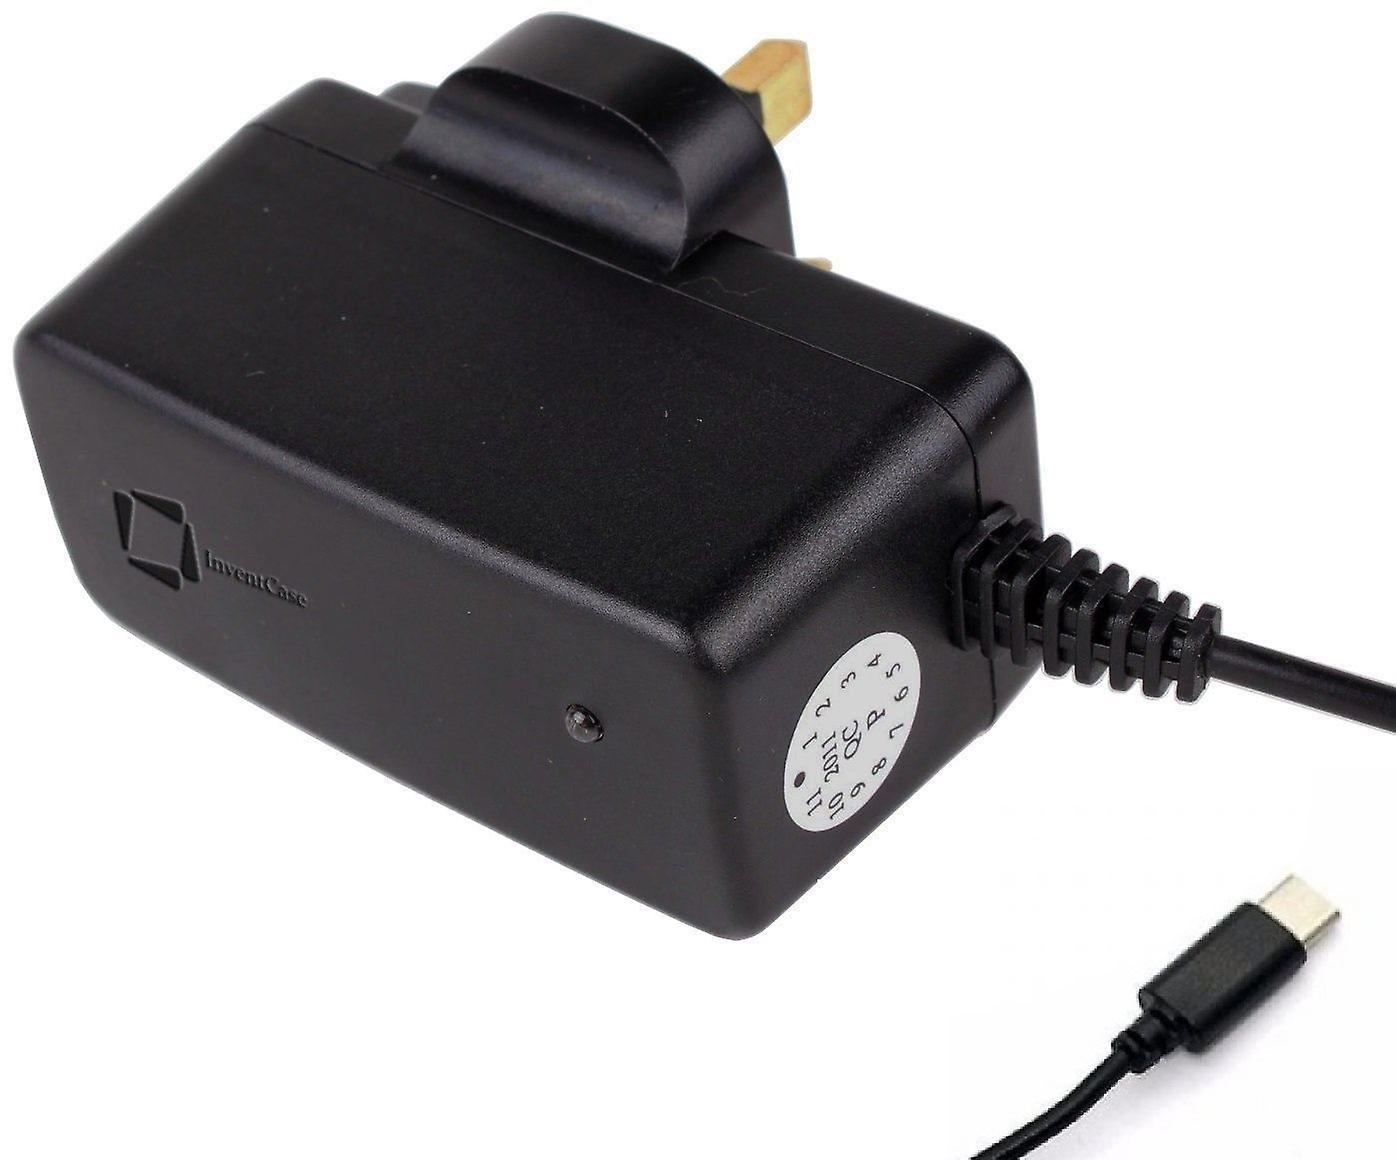 InventCase 1,5 m USB Typ C Portable Reisen 3 Pin AC Wand Ladegerät Power Adapter Netzstecker für Huawei P20 / P20 Pro / P20 lite